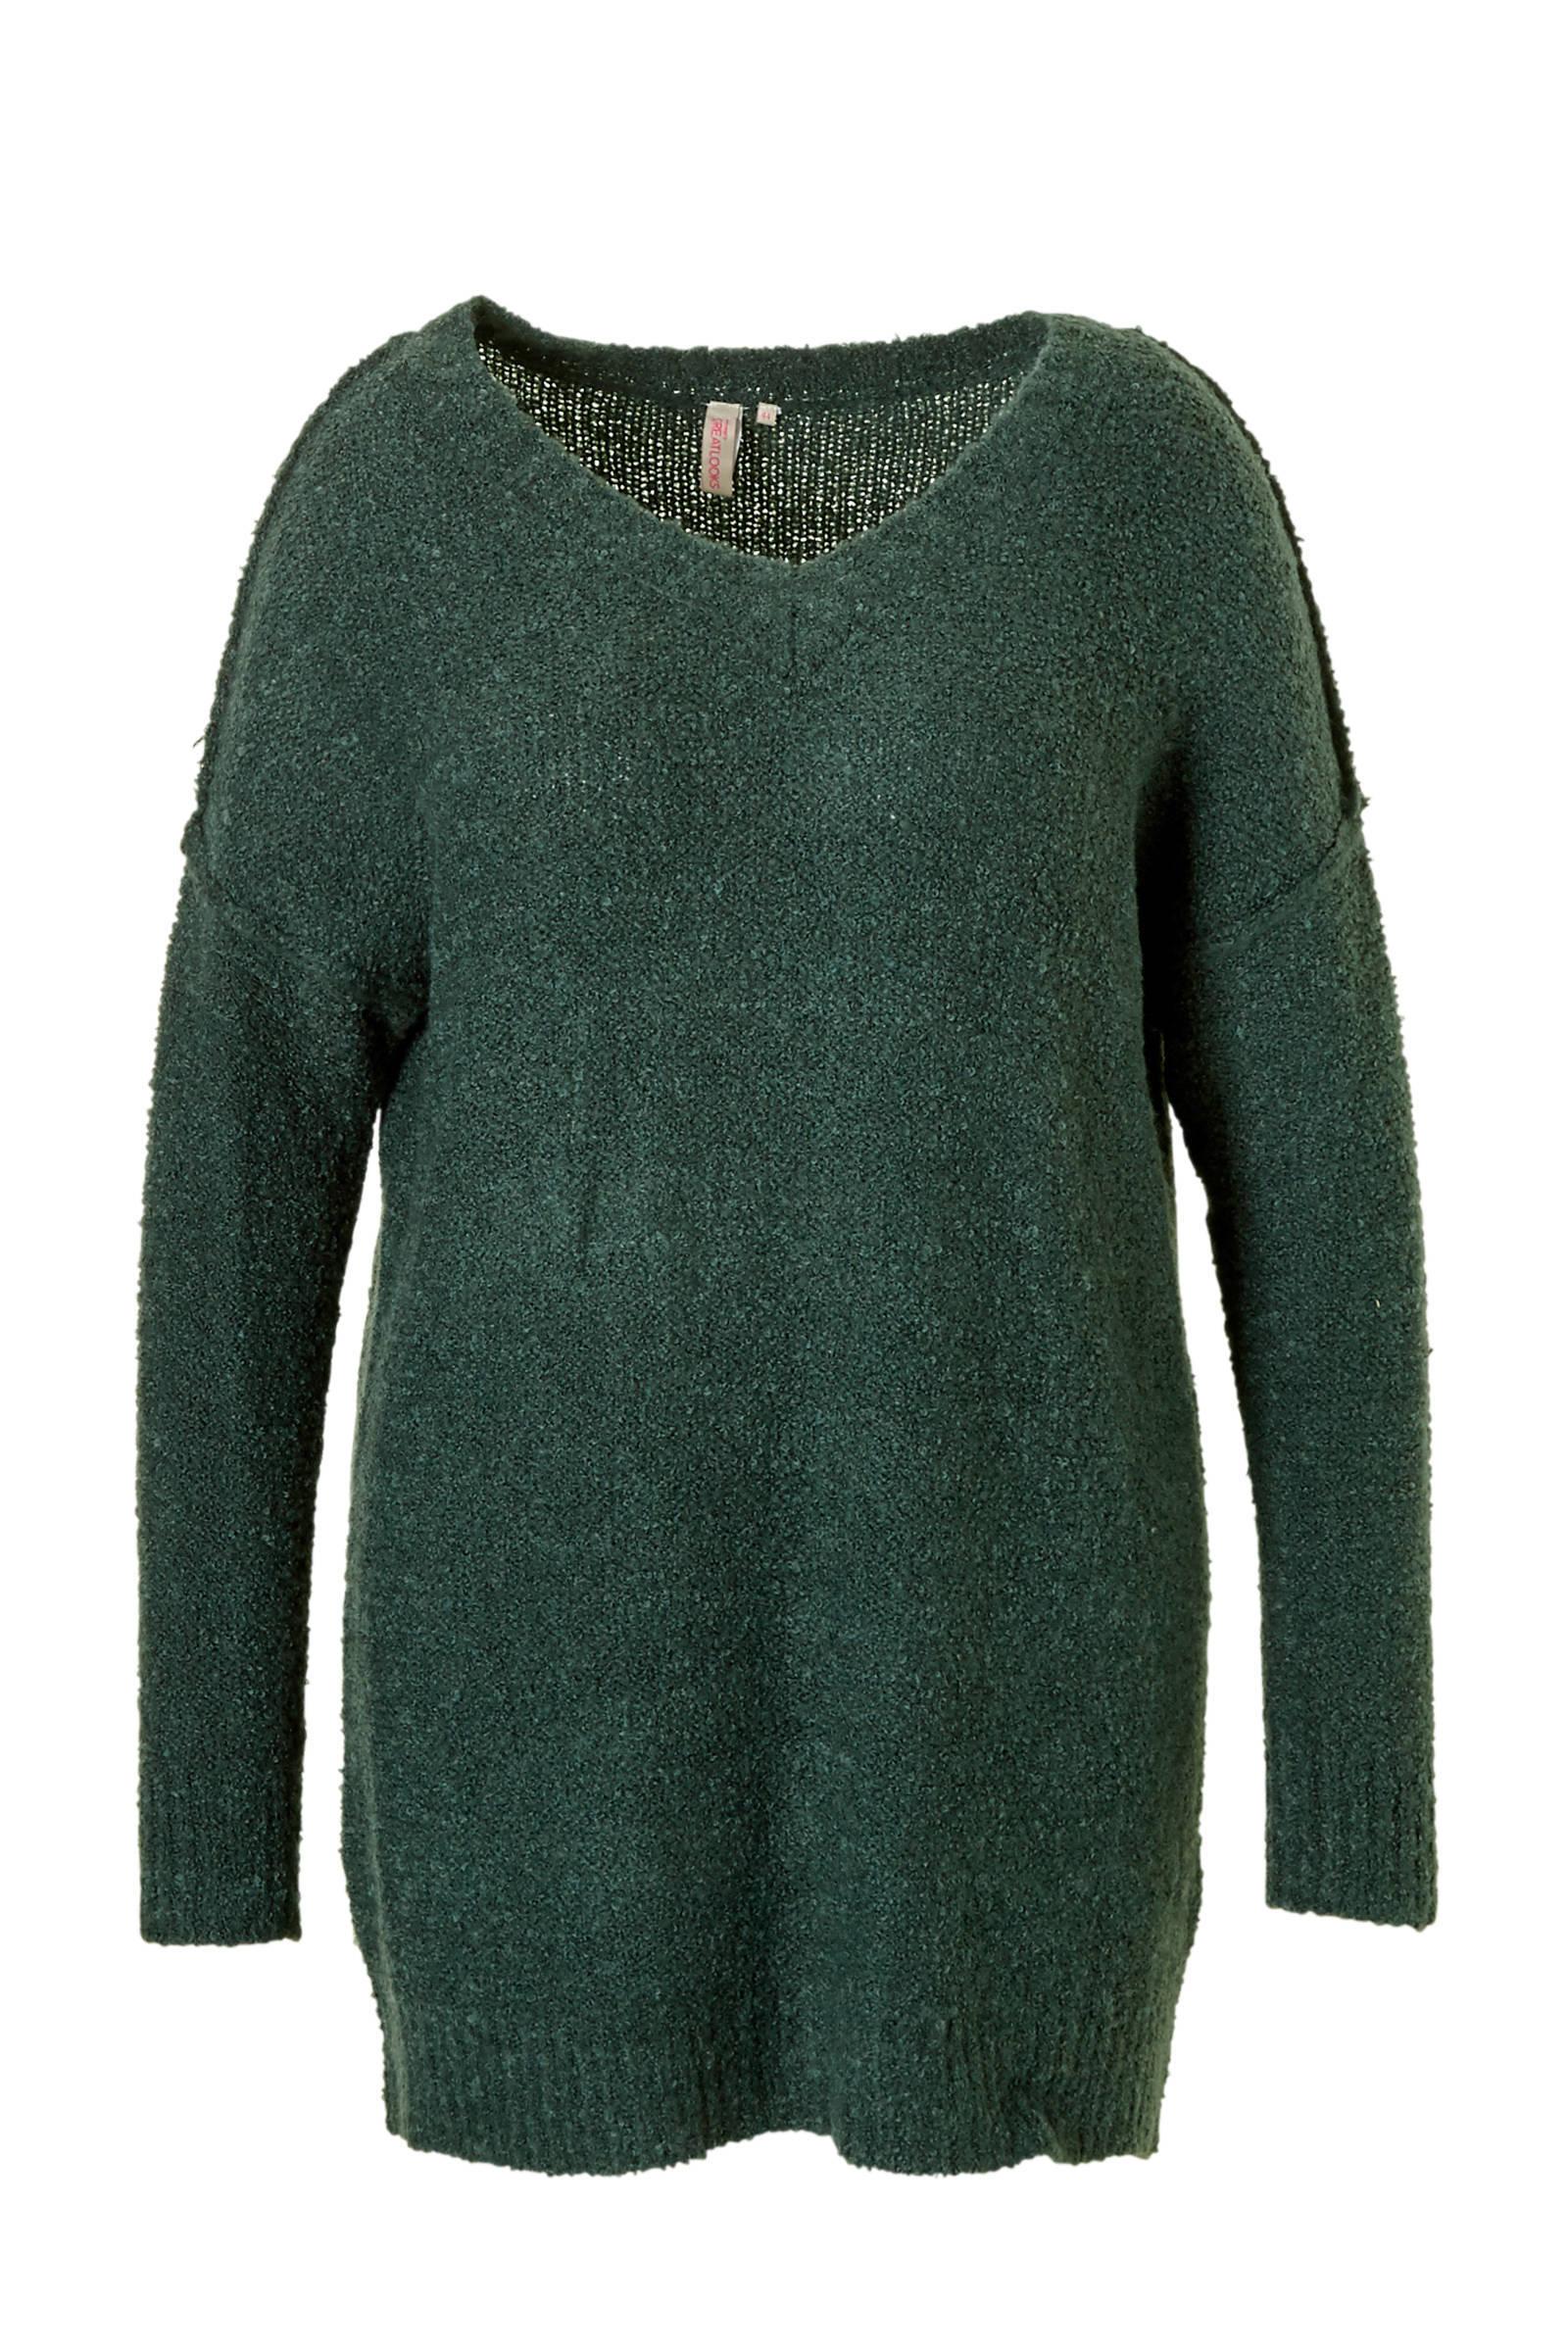 whkmp's great looks trui met V-hals (dames)